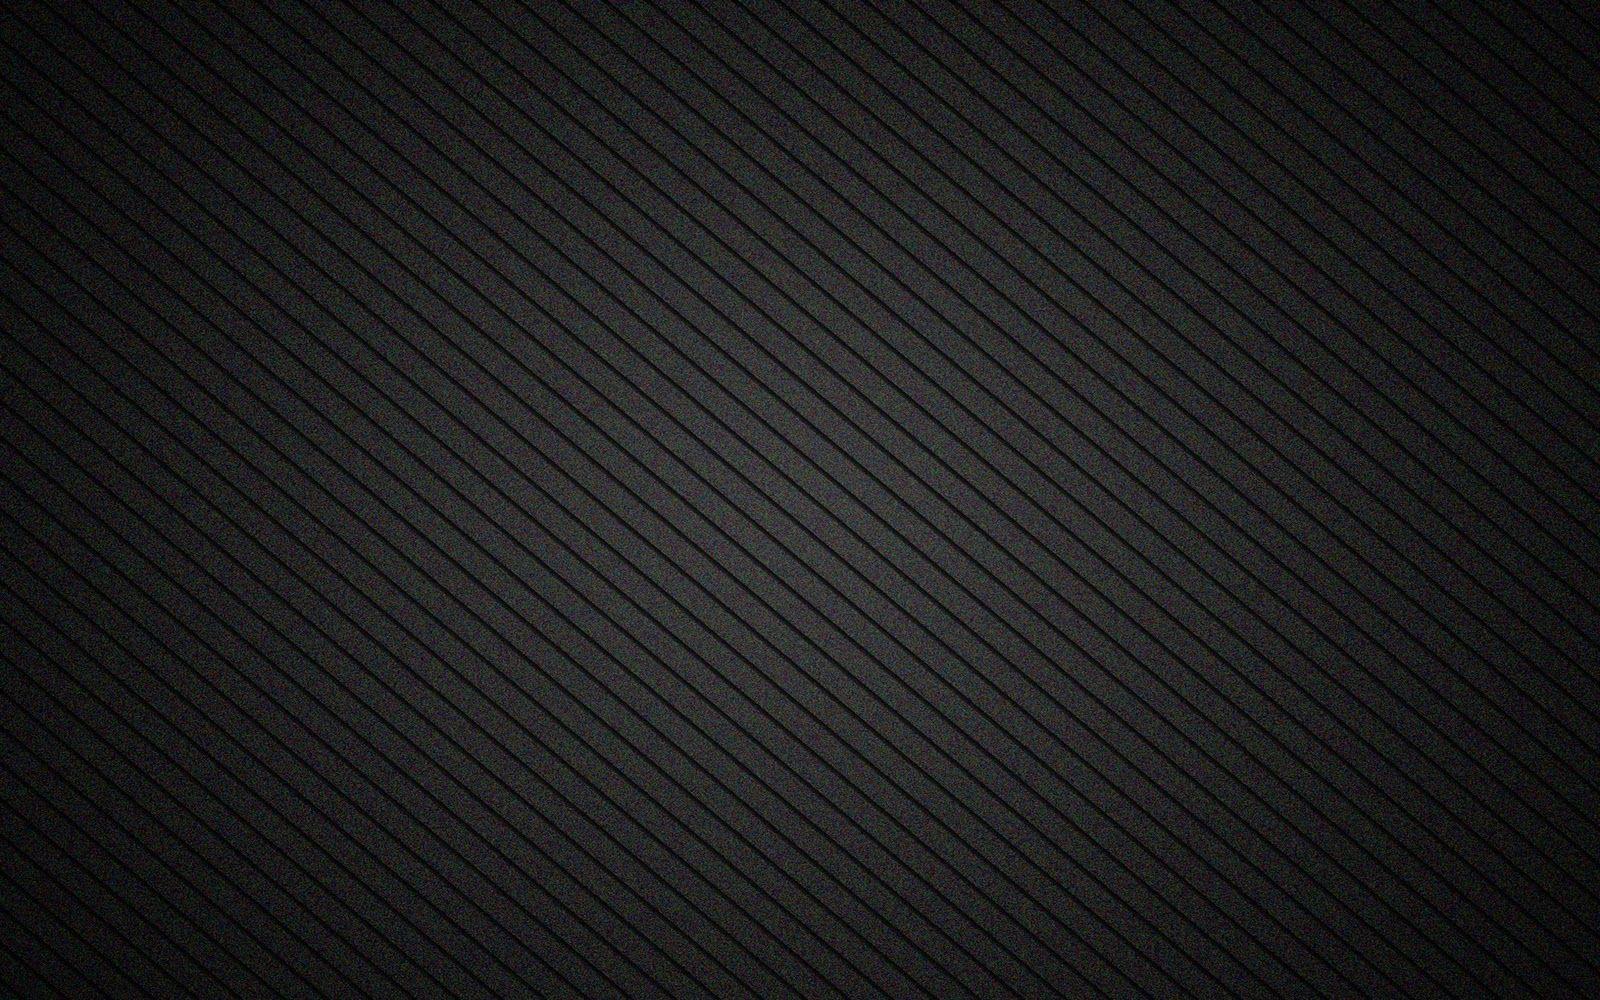 Dark Wallpaper Vektor Best Wallpaper Hd Black Wallpaper Dark Wallpaper Black Hd Wallpaper